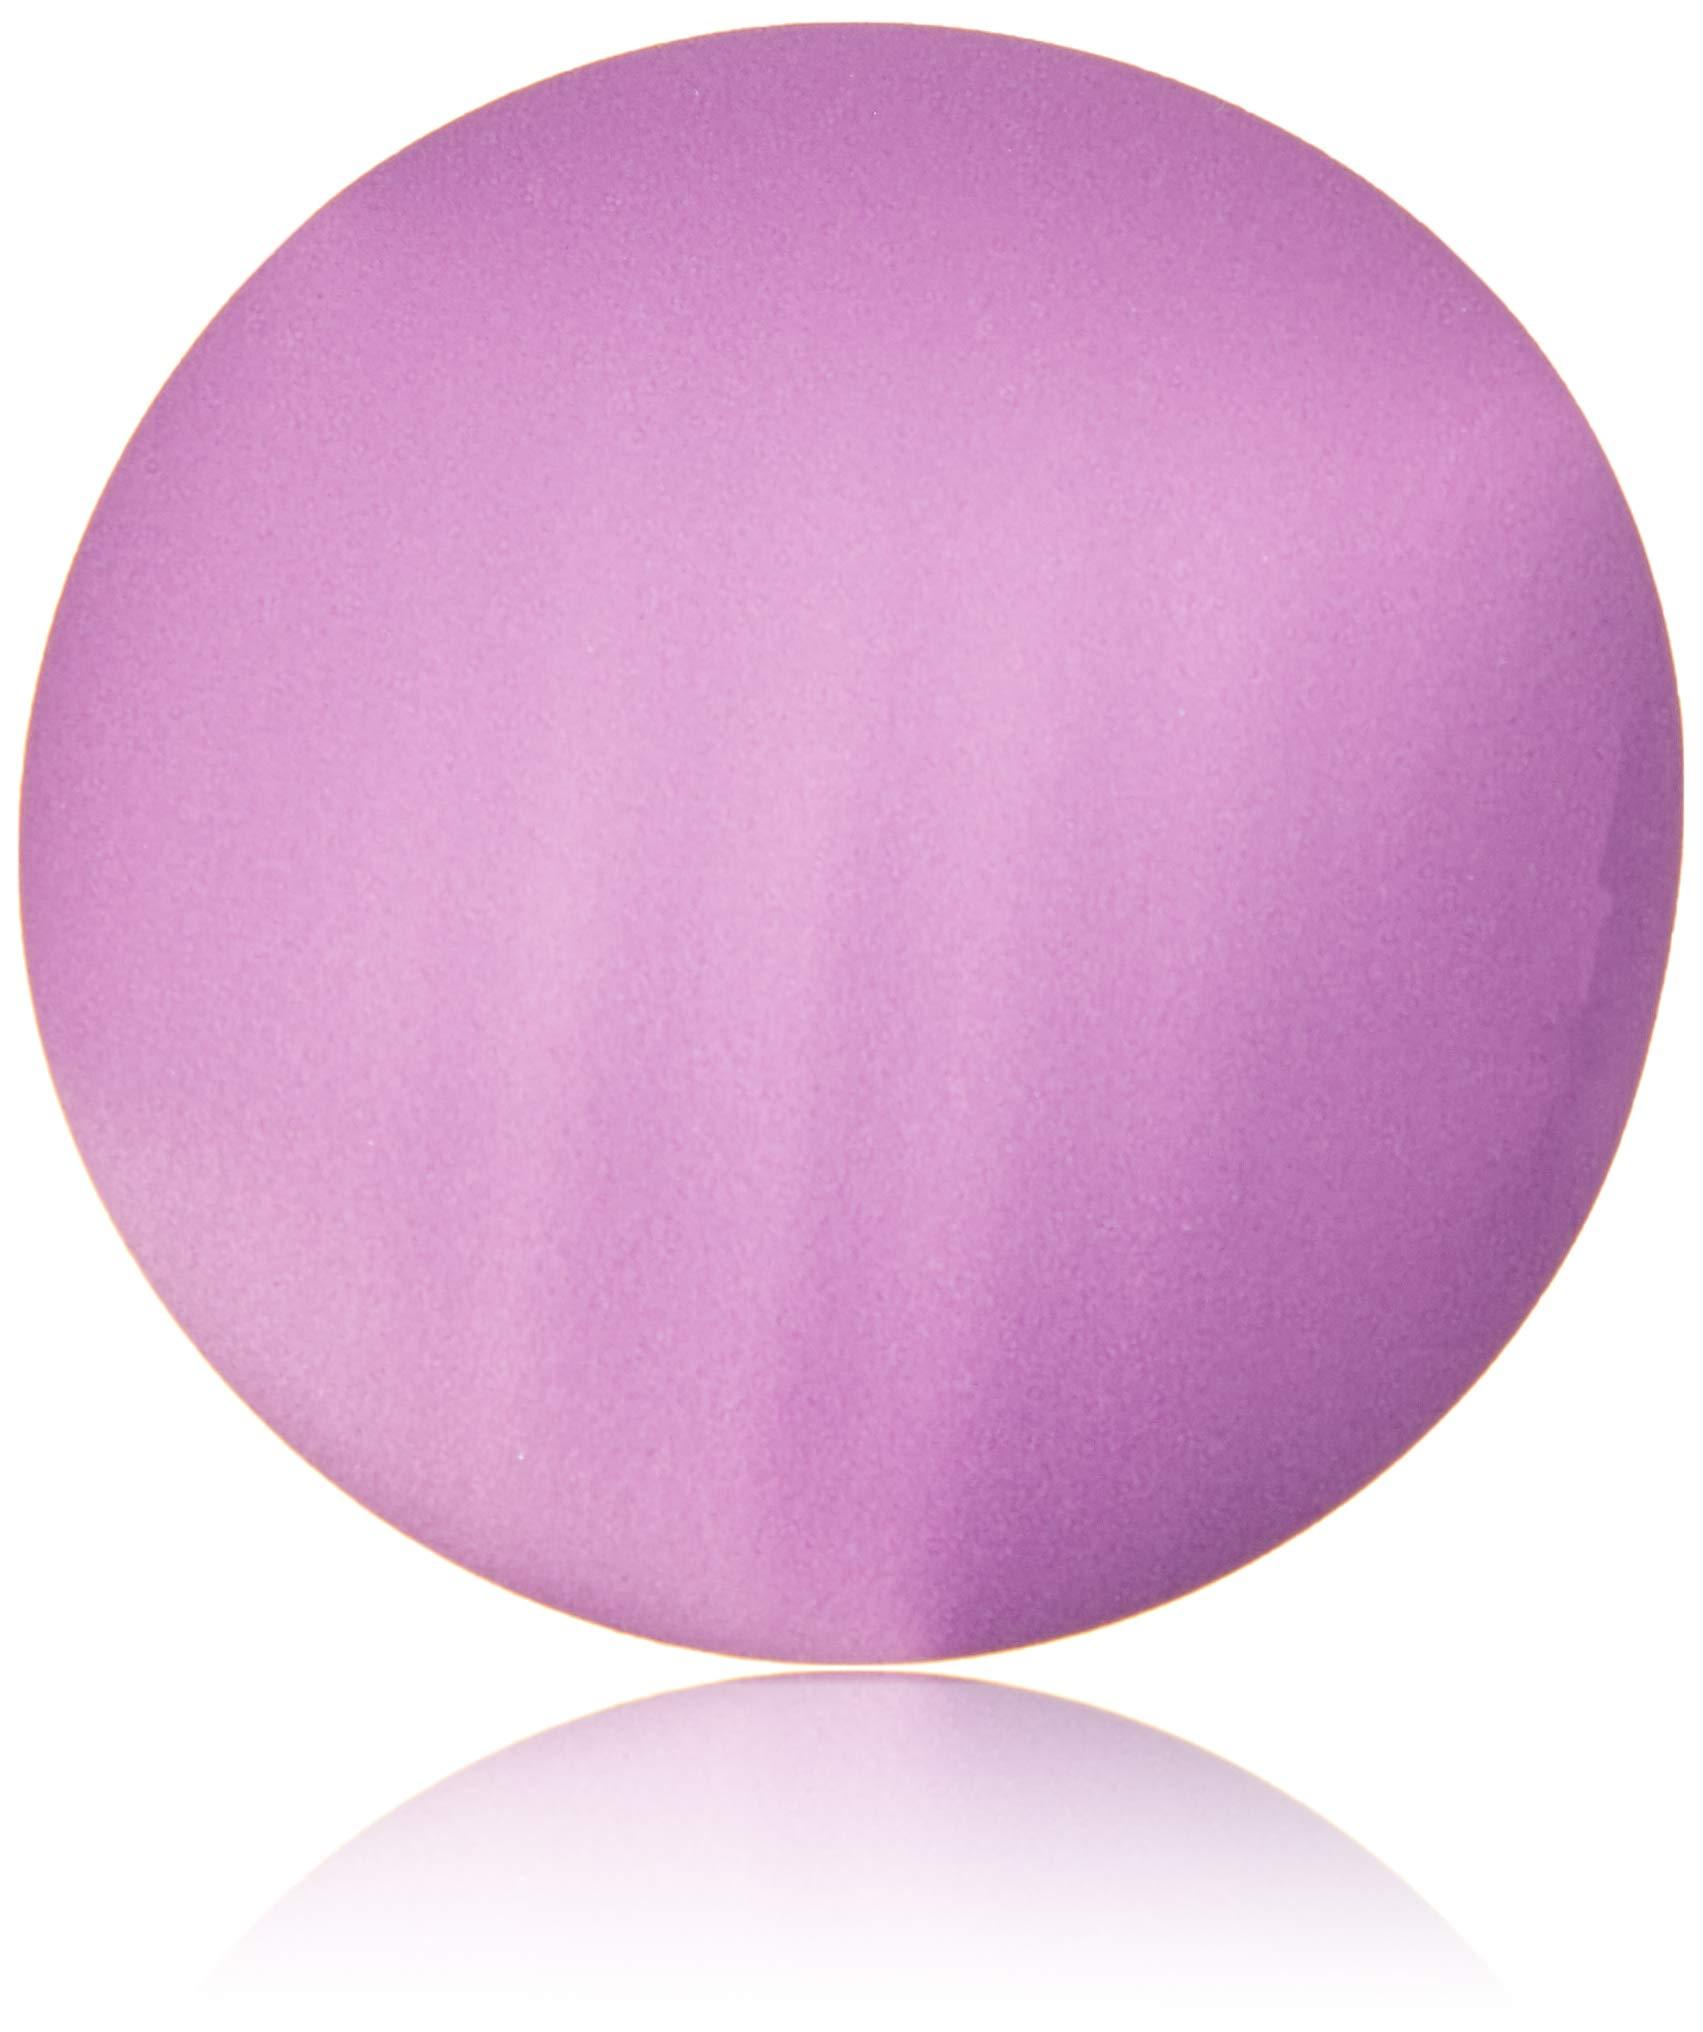 Mettoo Violet Body Foil Pro, 200 Count